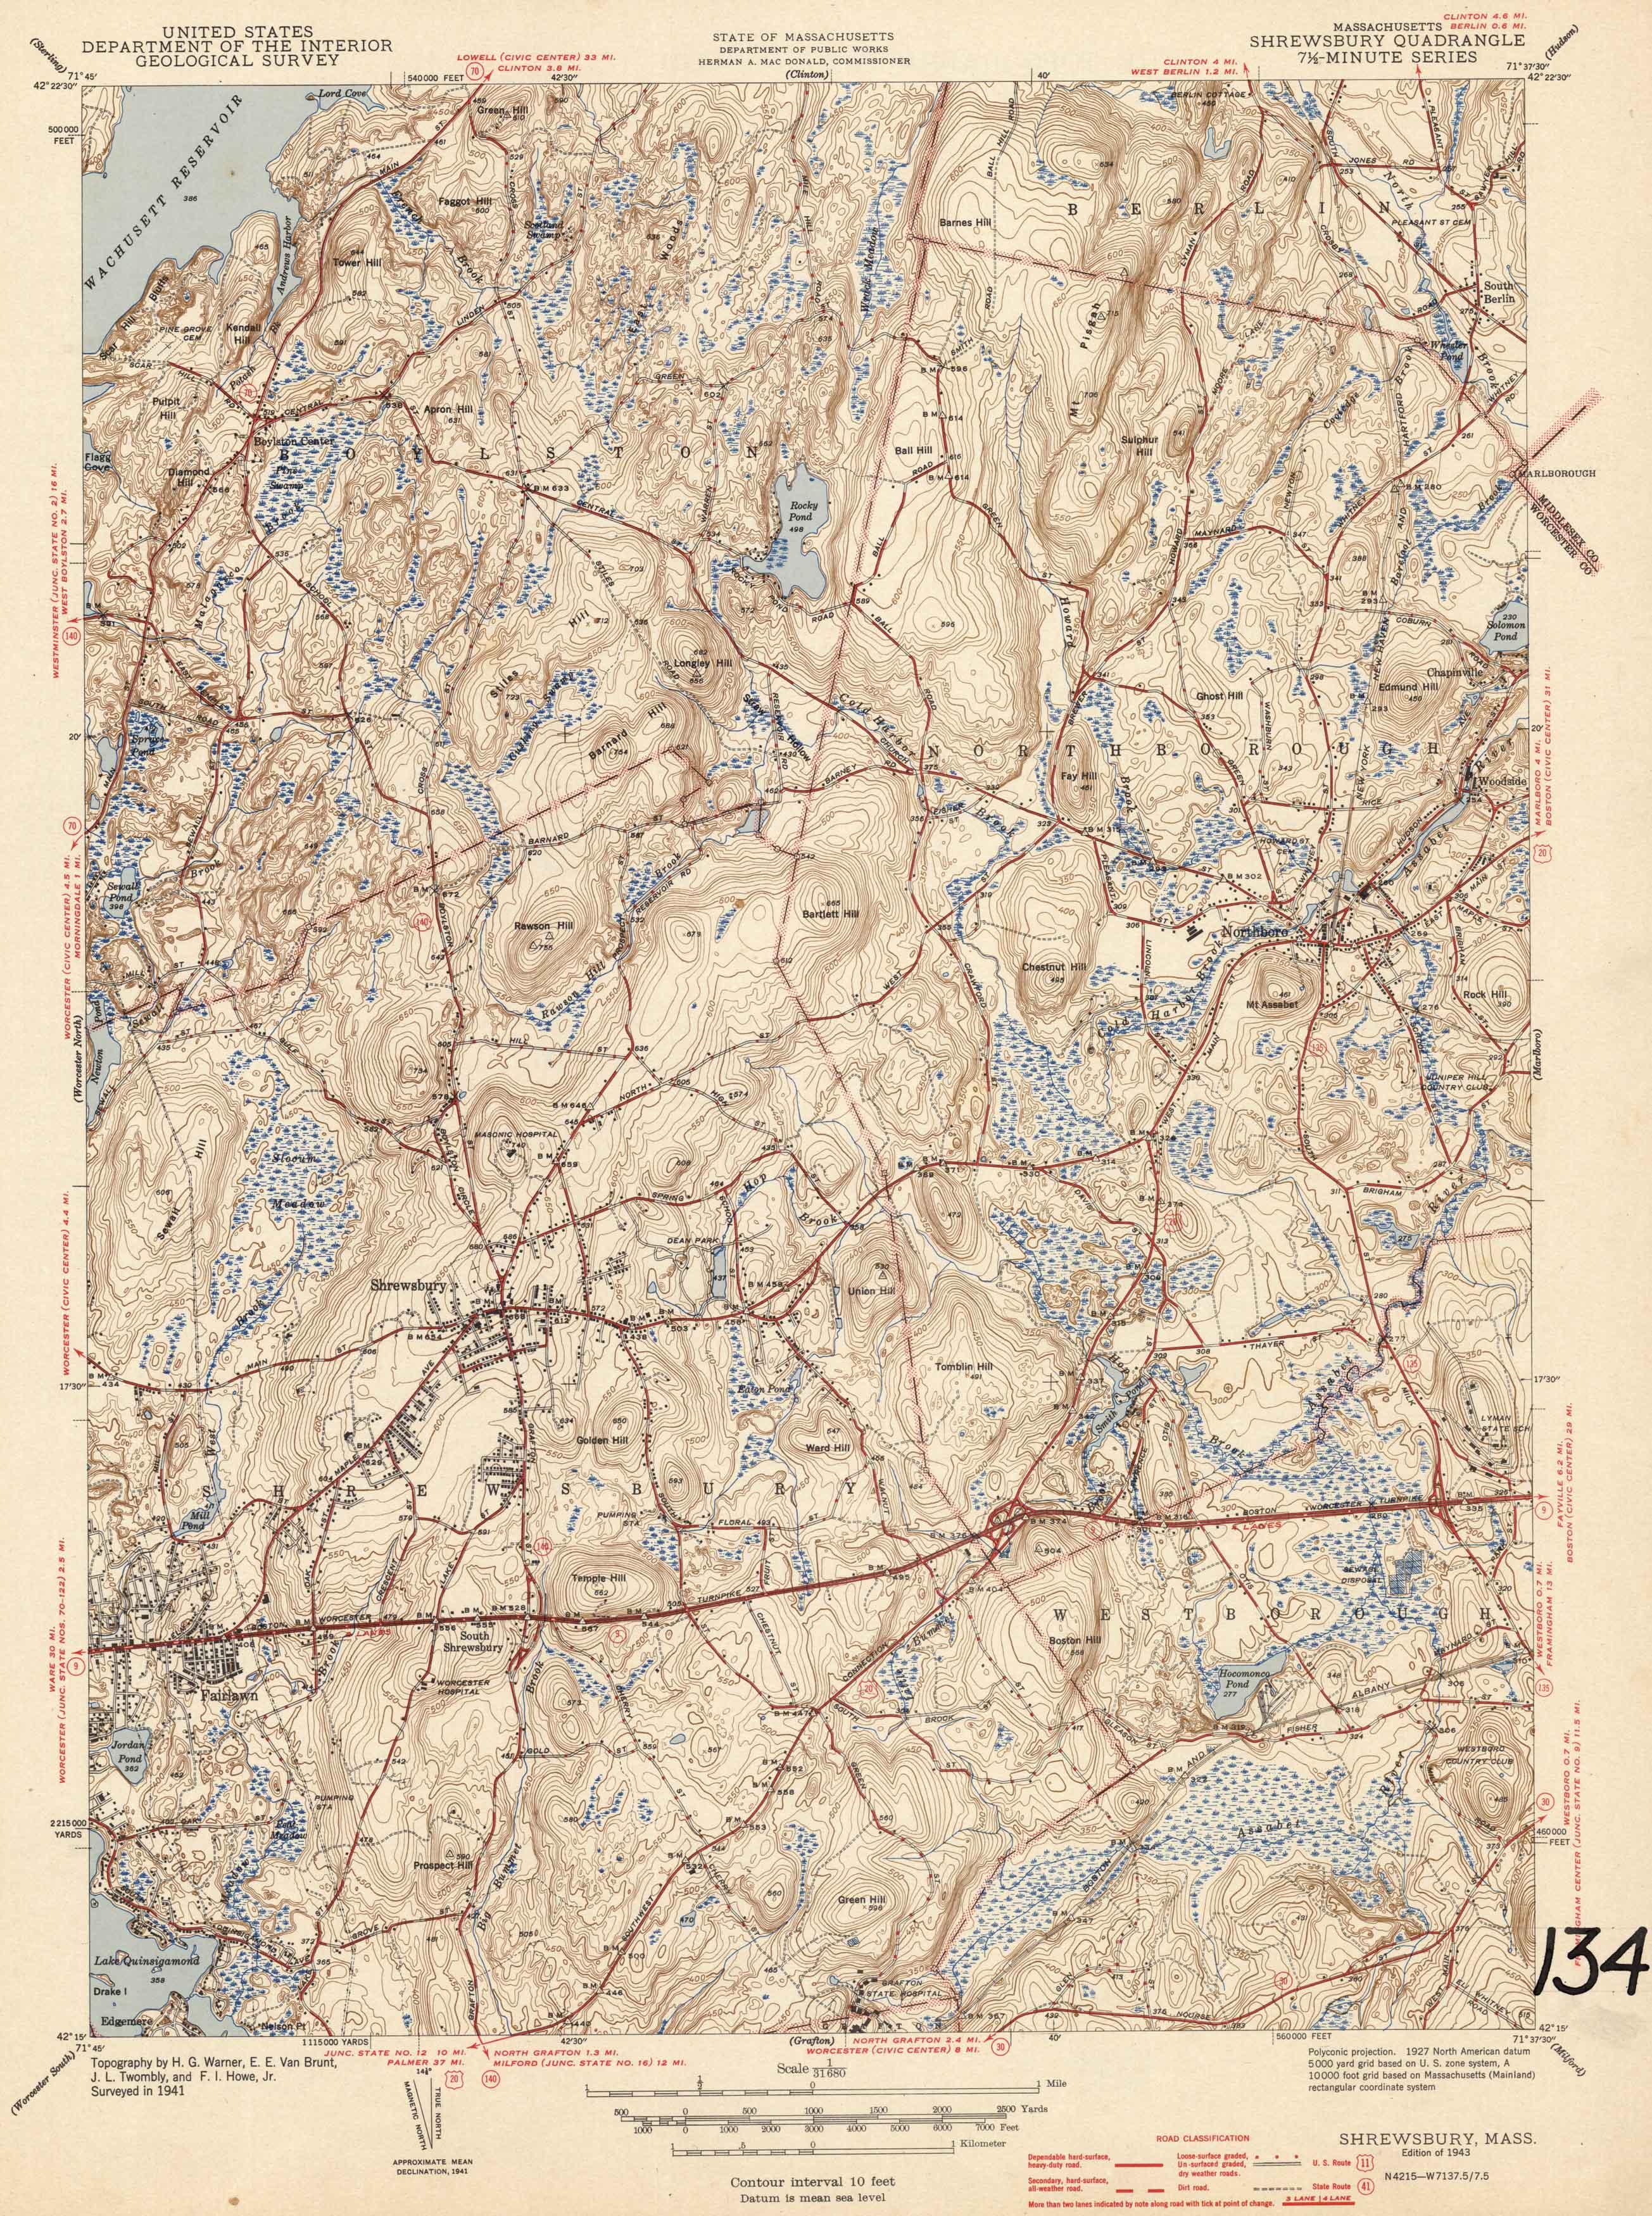 U.S. Geologic Survey 1943 Map of Shrewsbury, Massachusetts